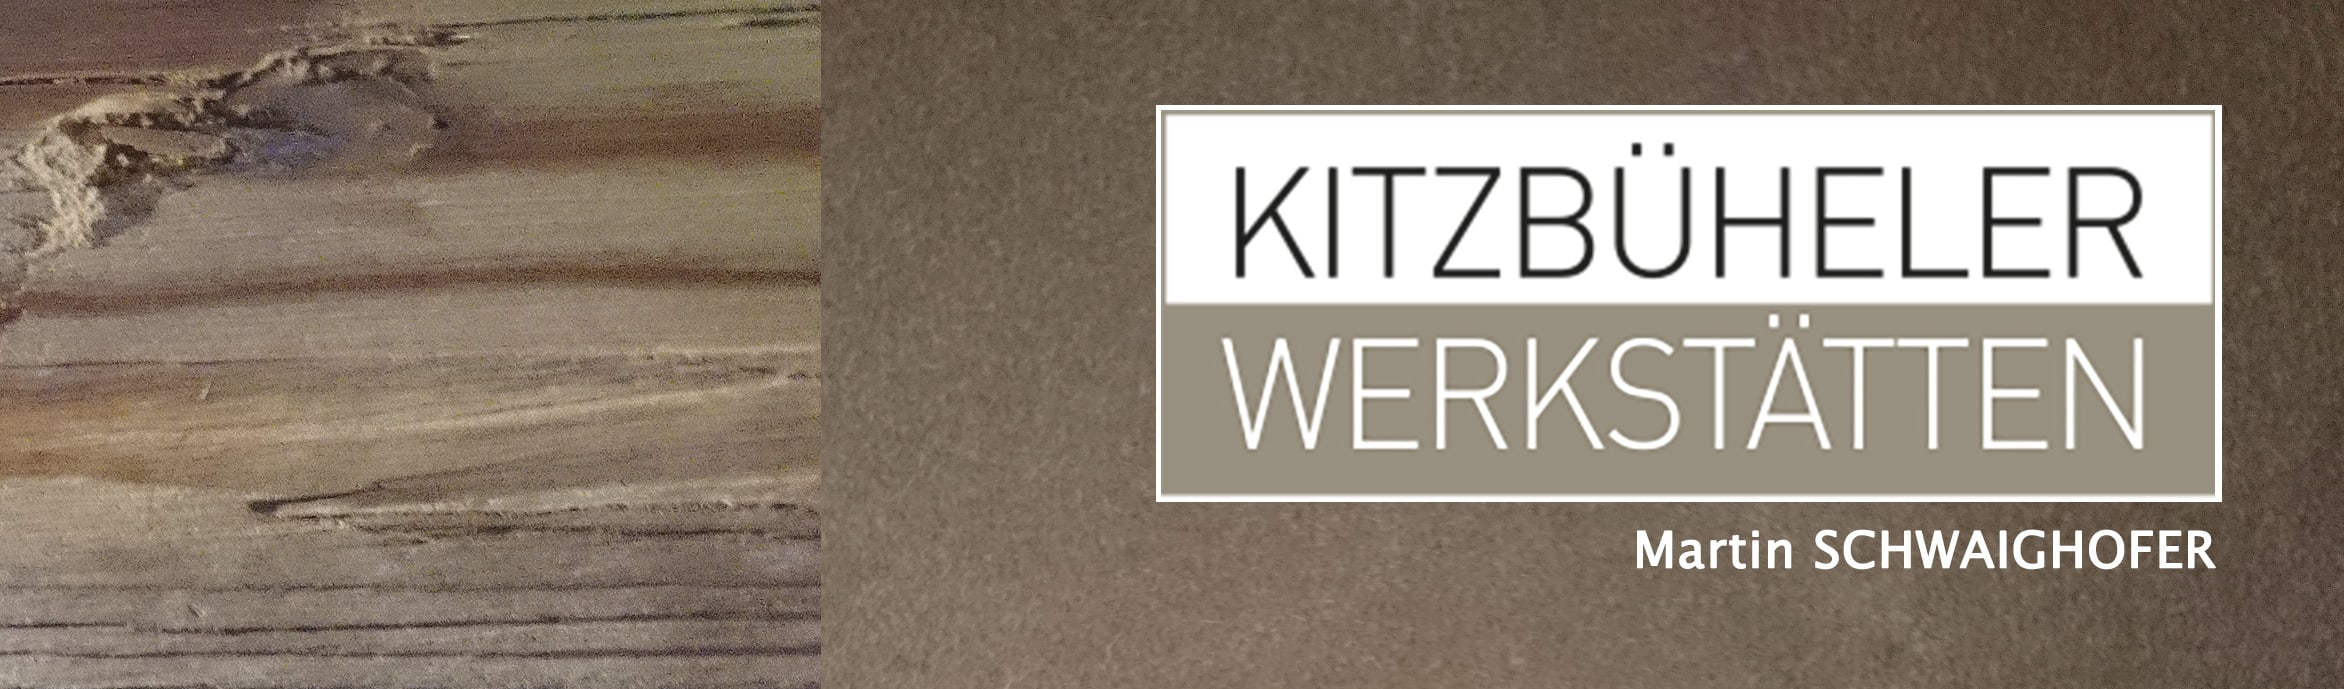 Kitzbüheler Werkstätten